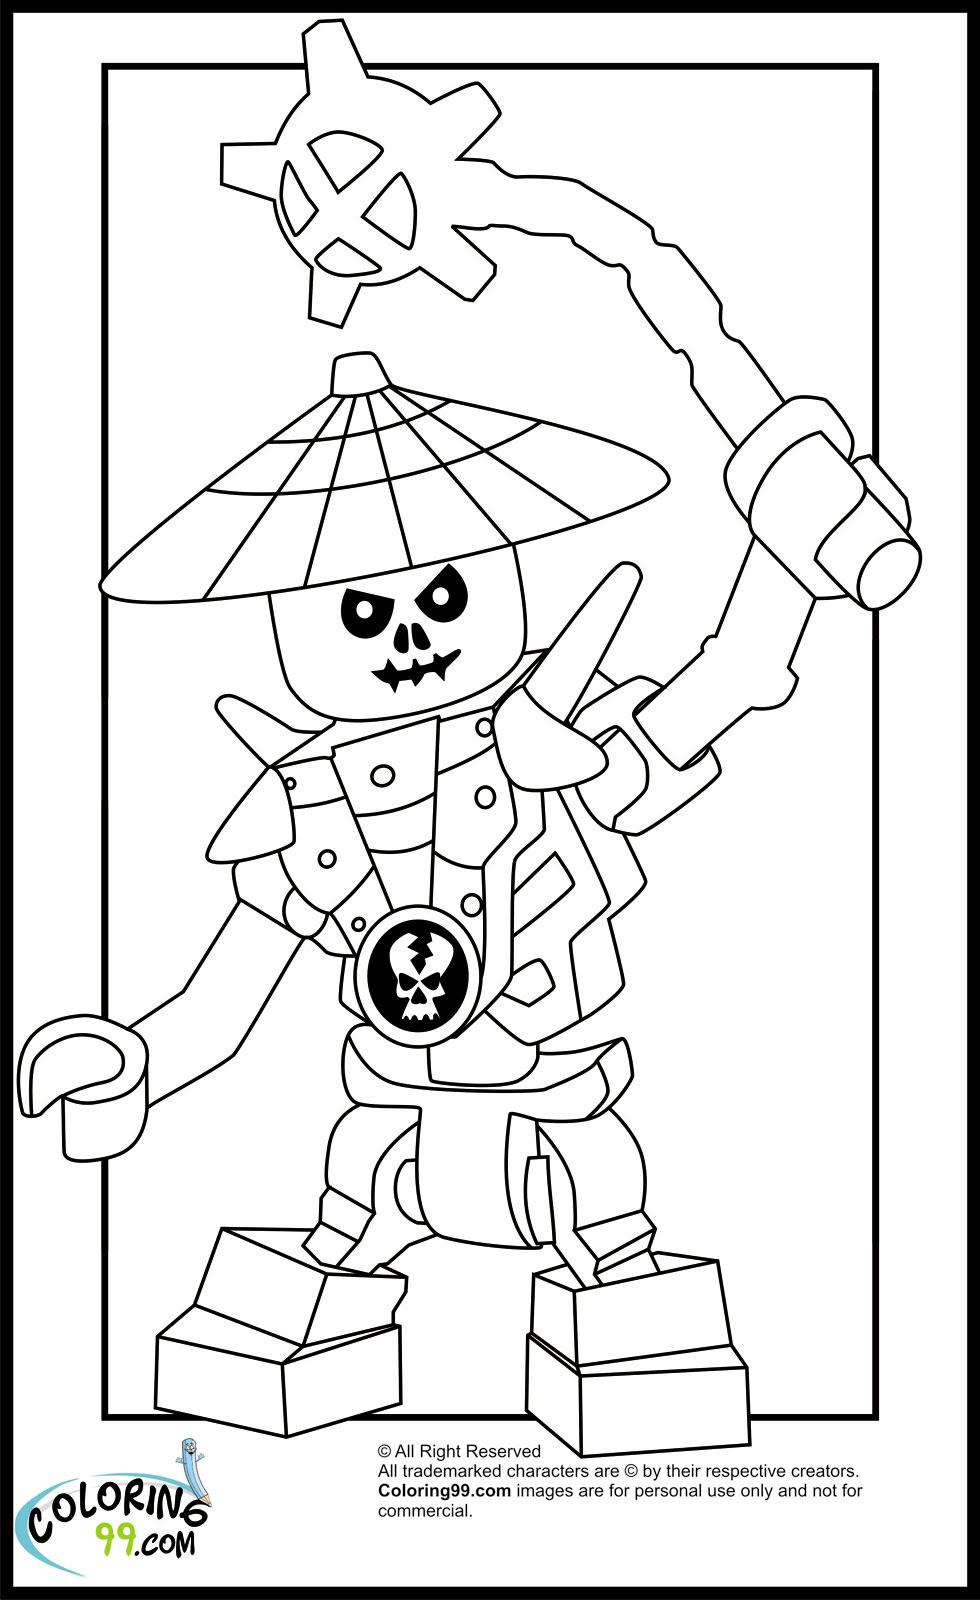 99 Top Ninjago Christmas Coloring Pages For Free